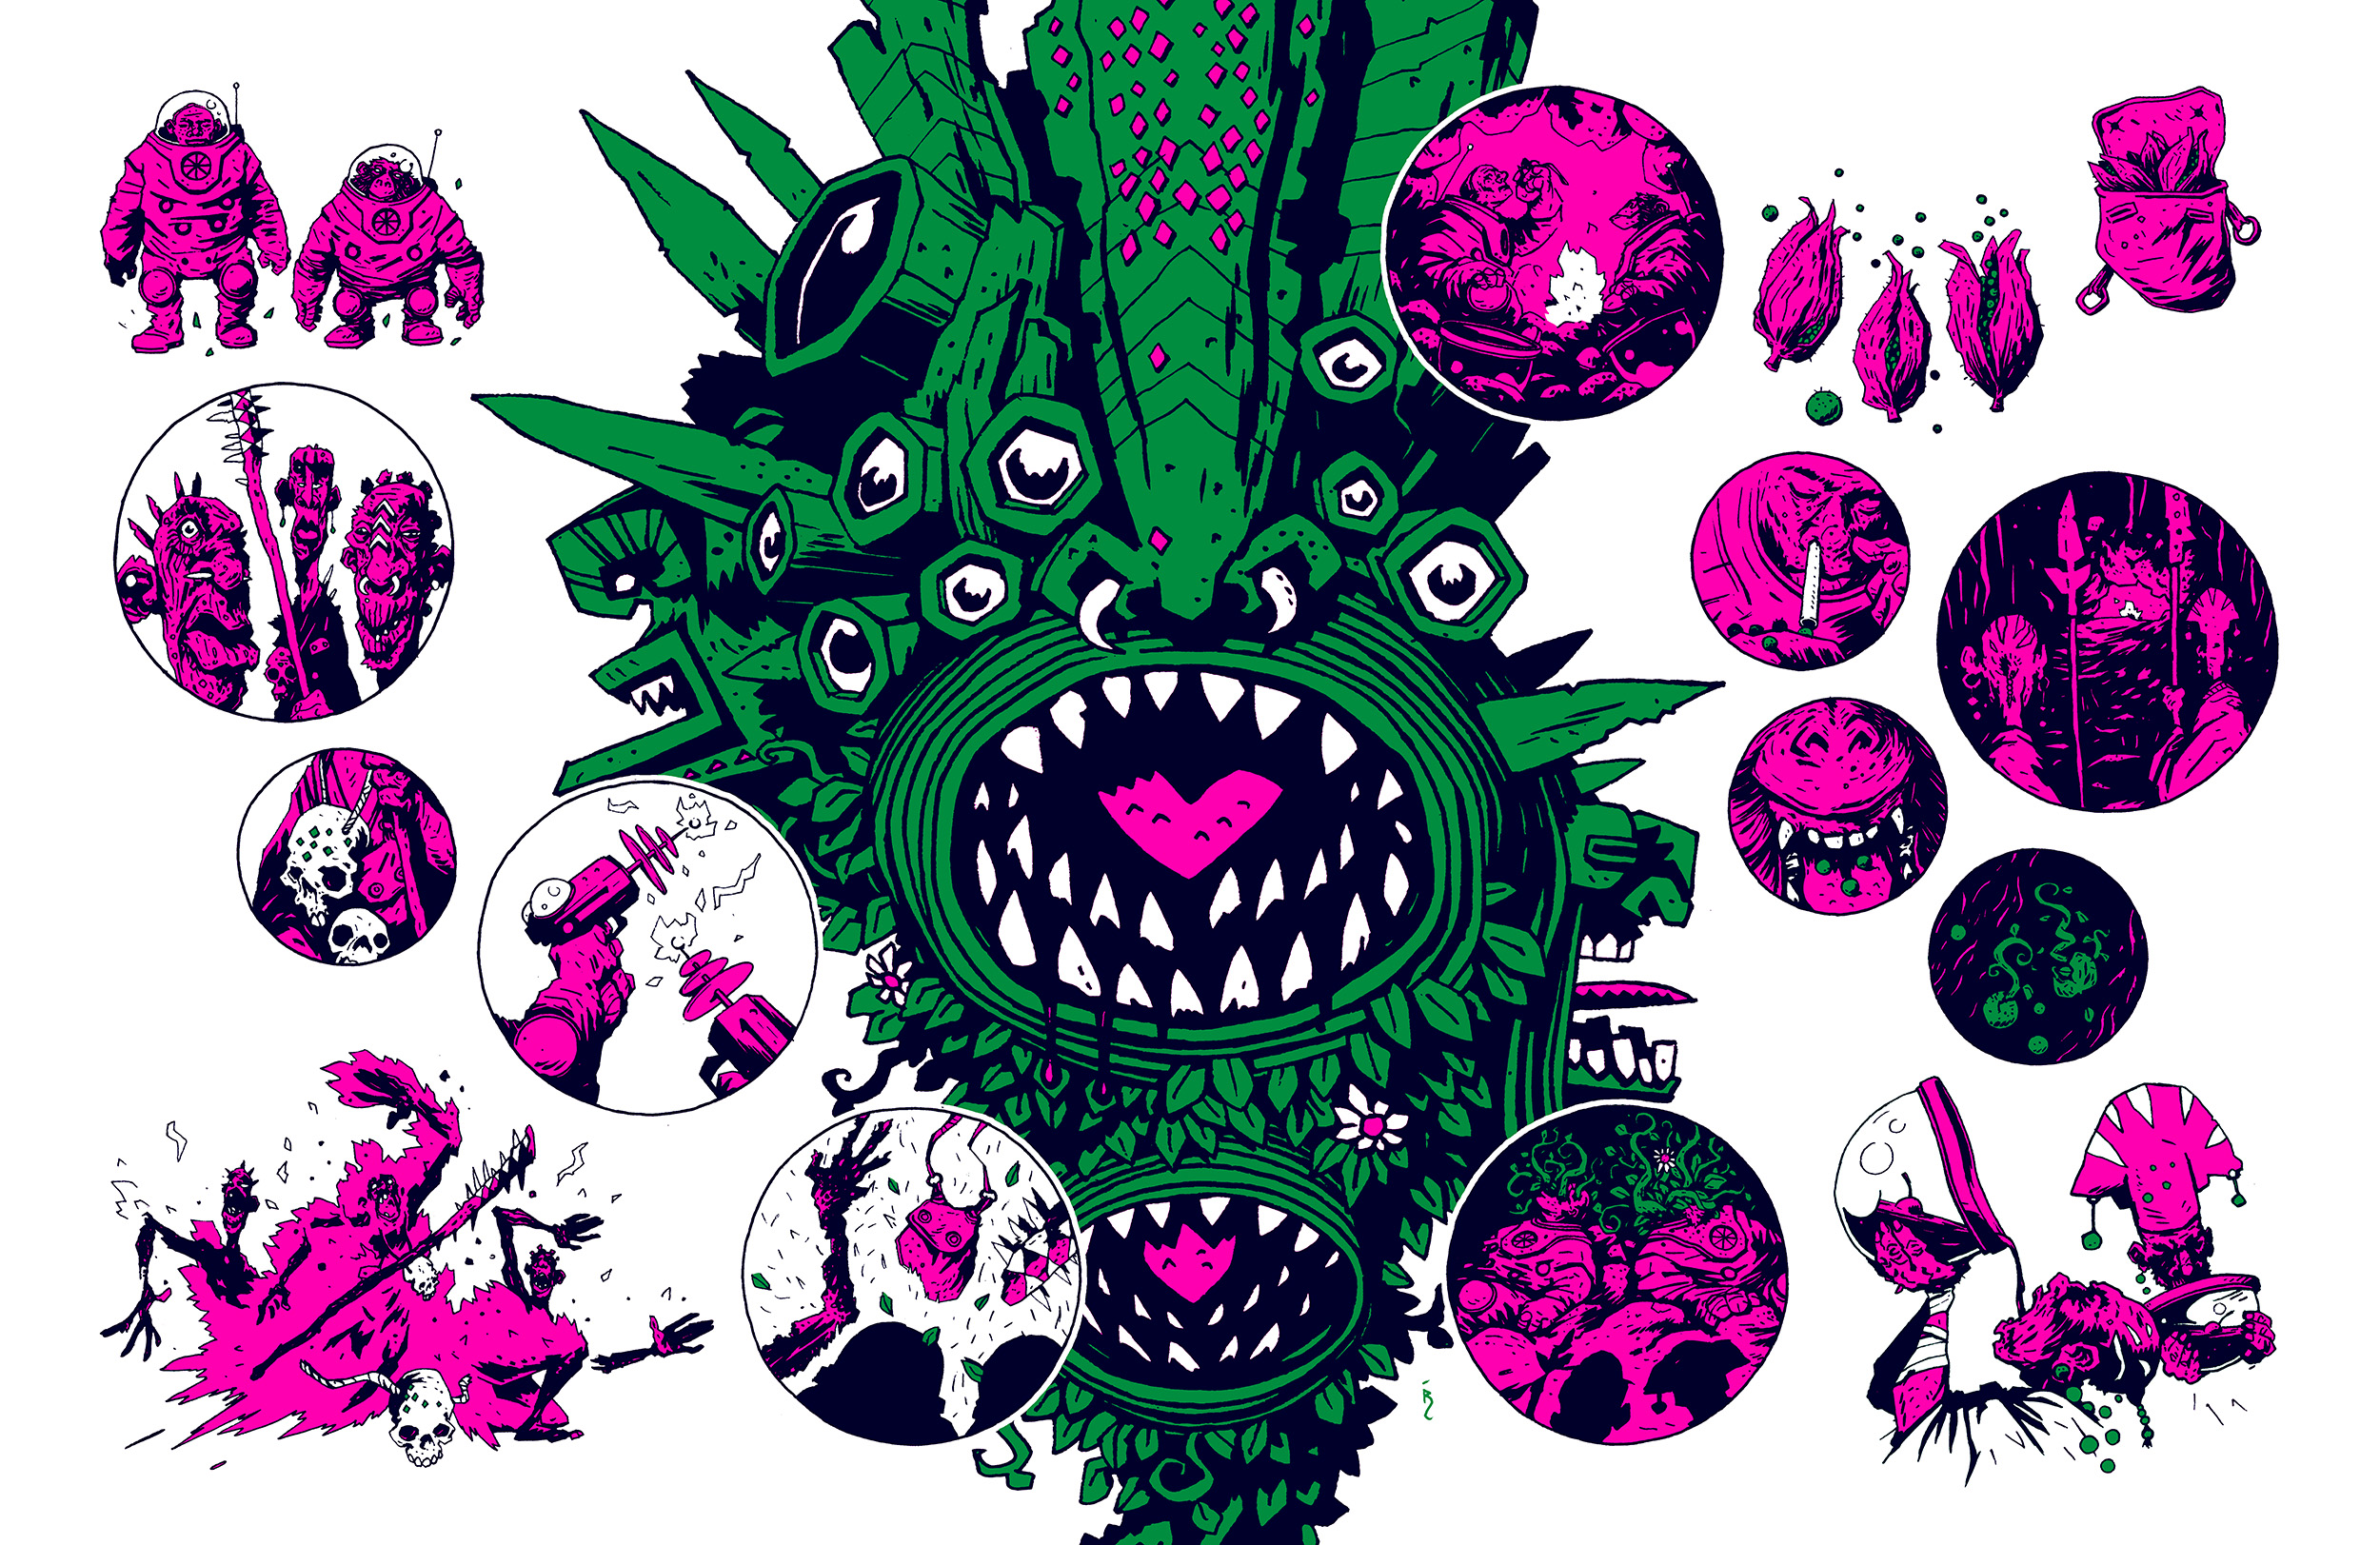 Planet Tropicana: final illustration/comic